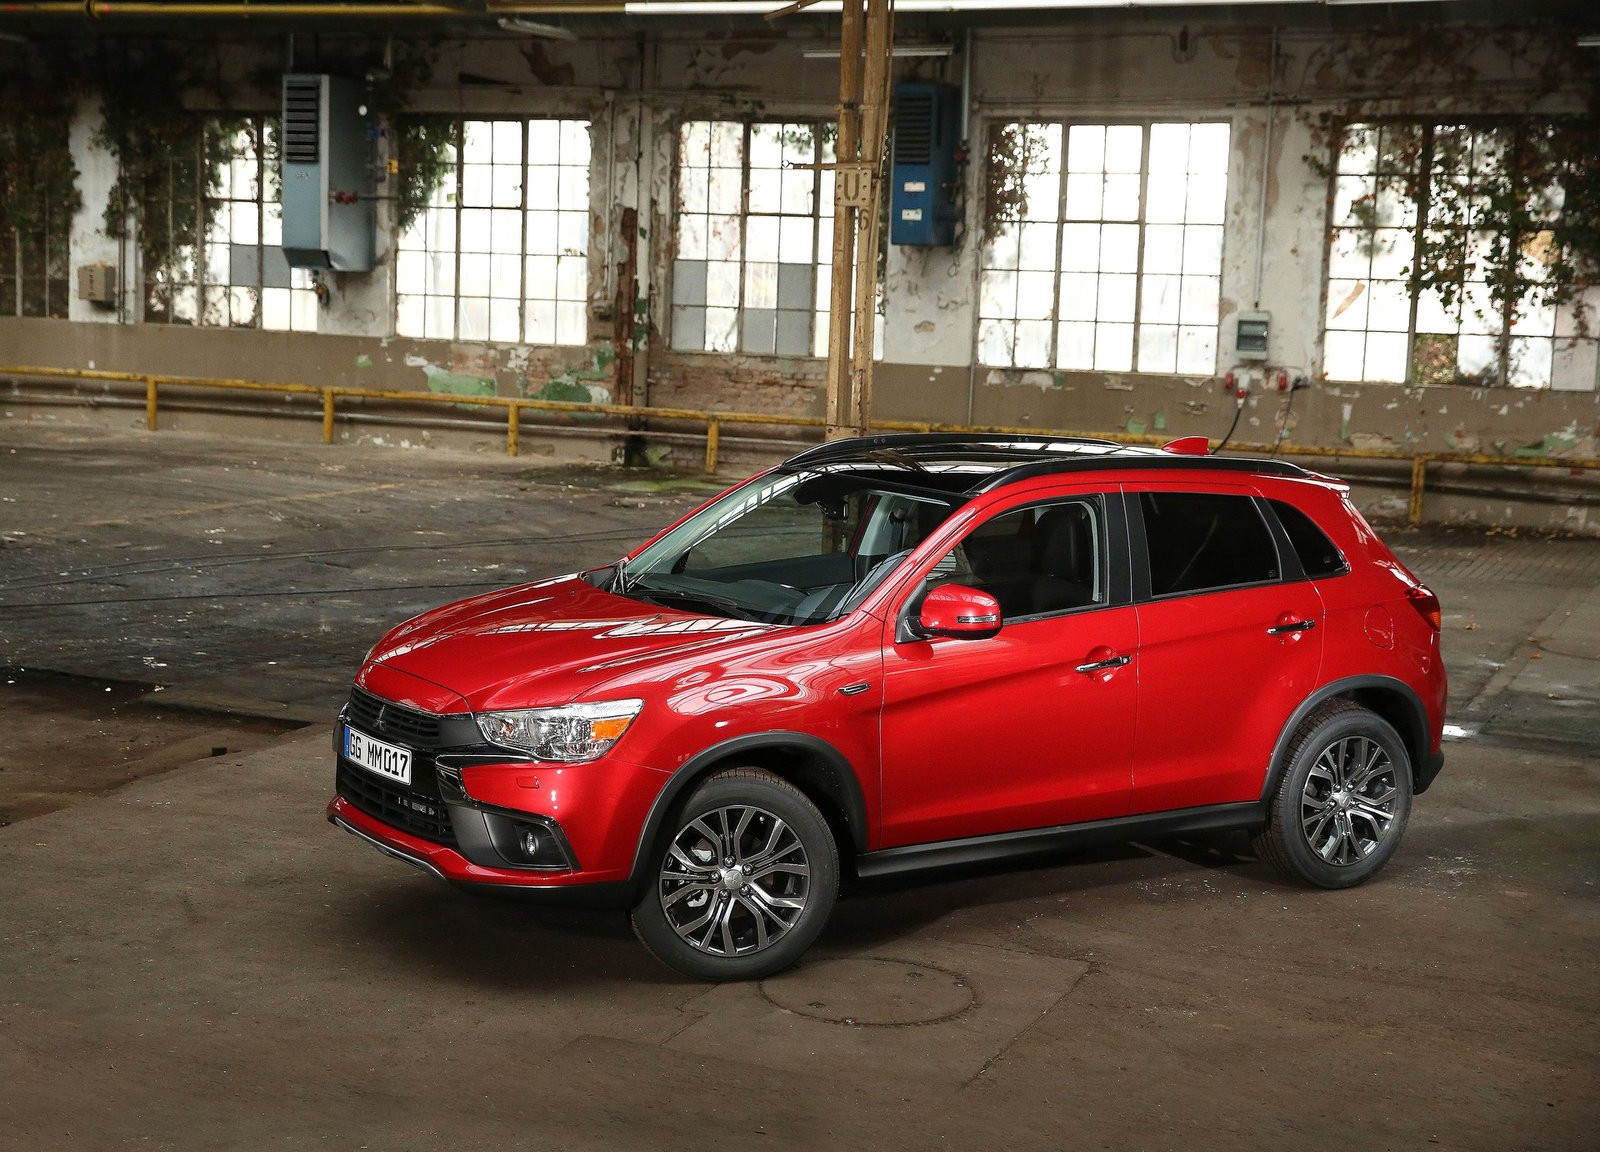 2017 Mitsubishi ASX Facelift Gets Dynamic Shield Design